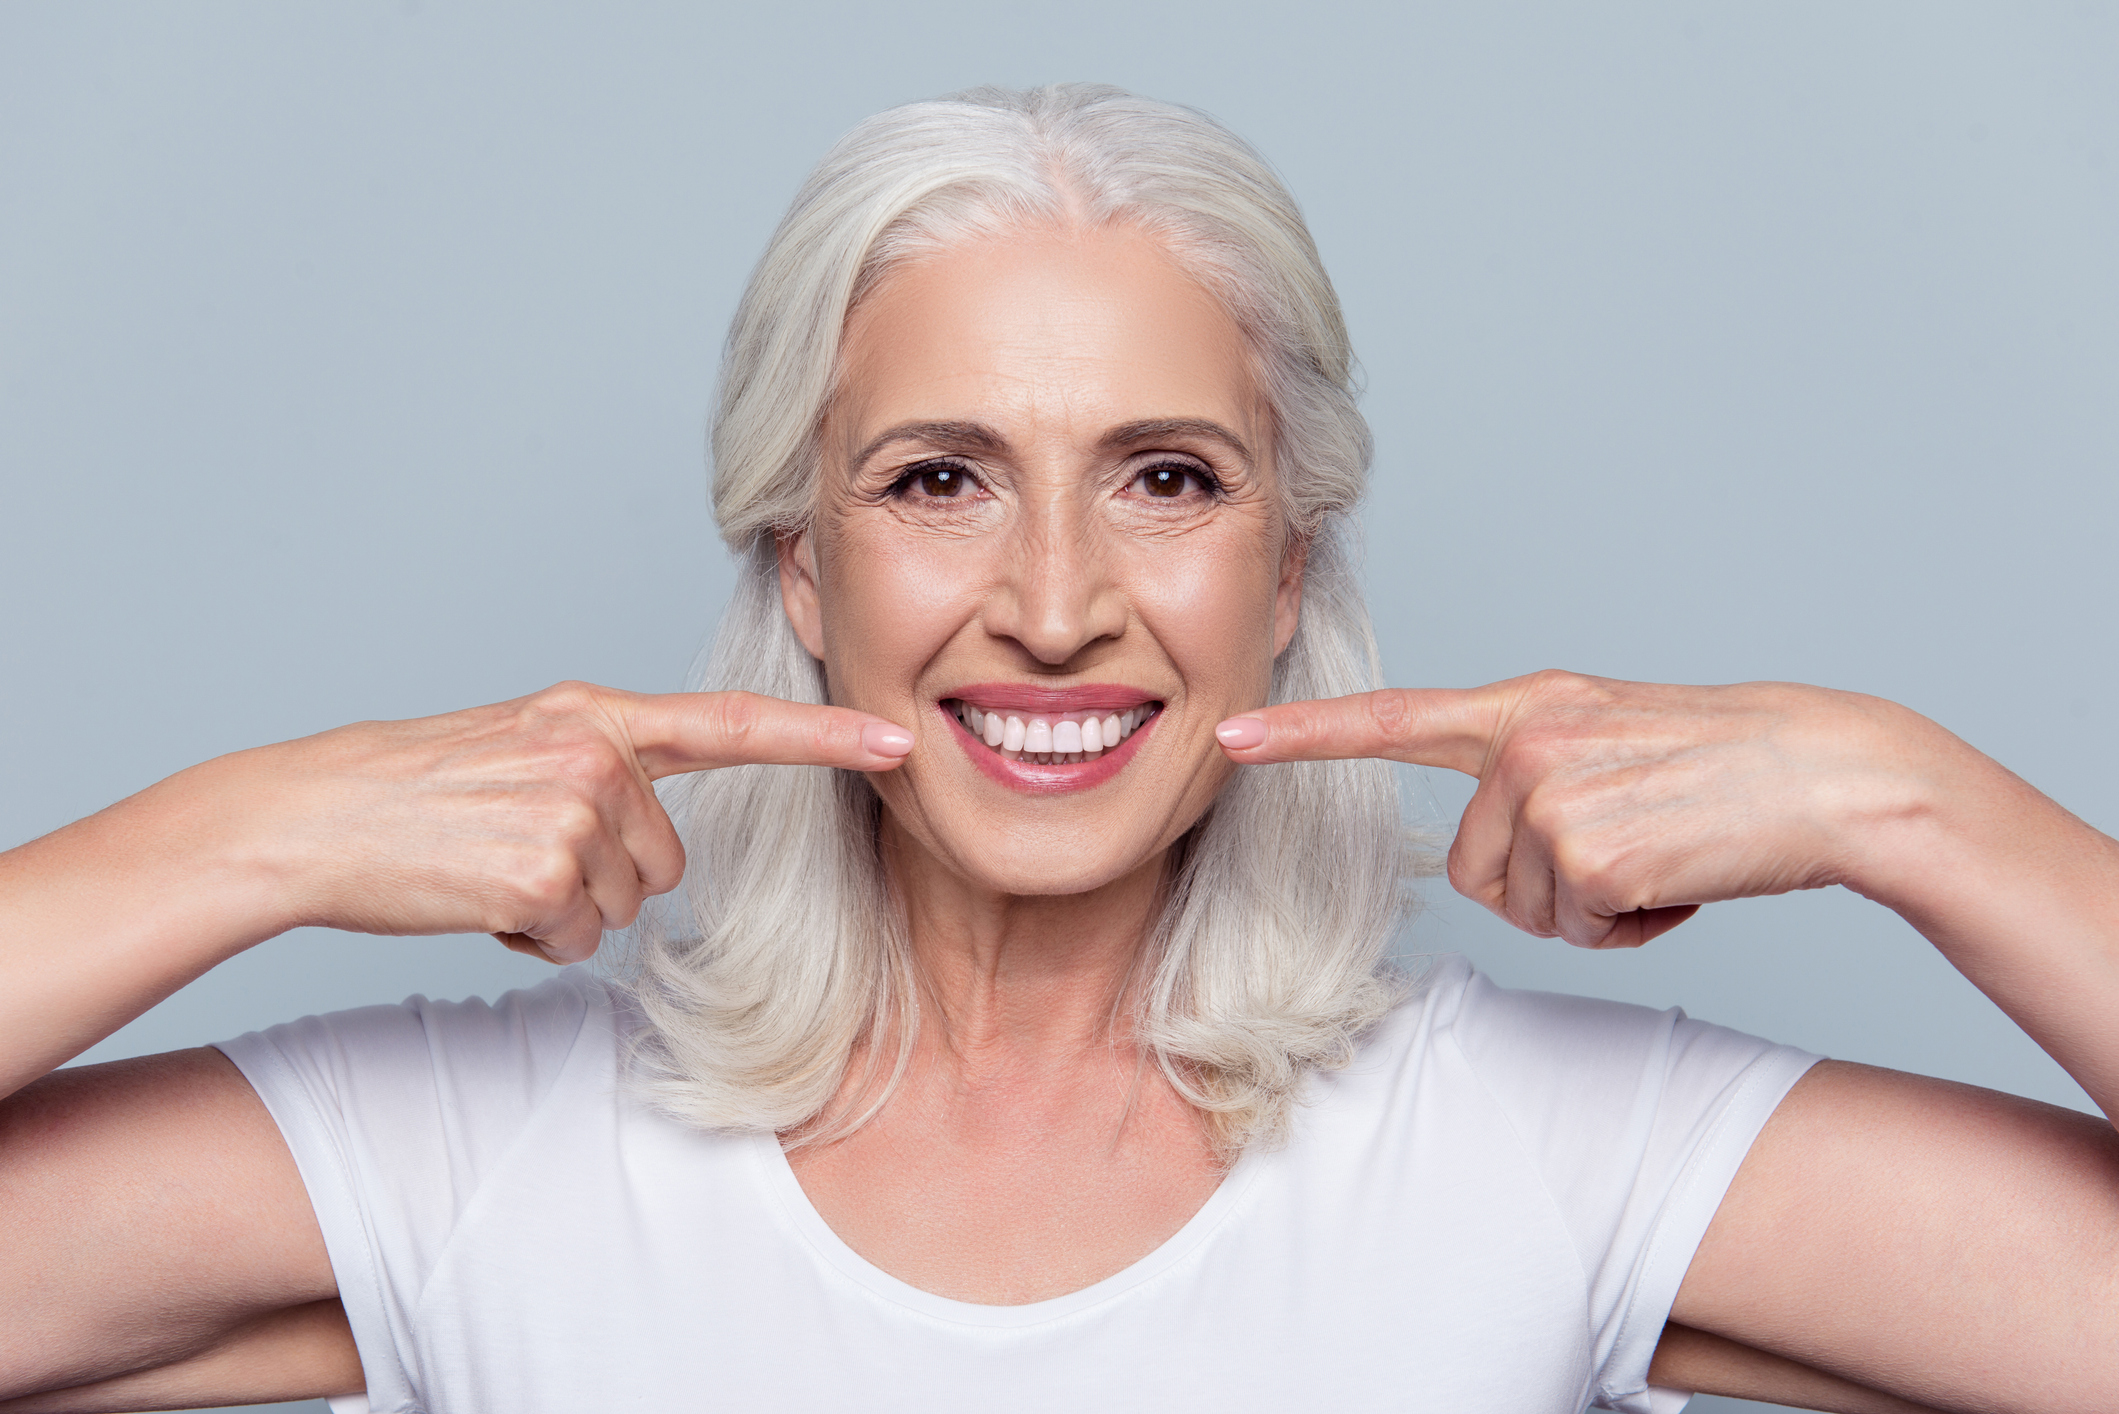 woman happy because of new dental impants